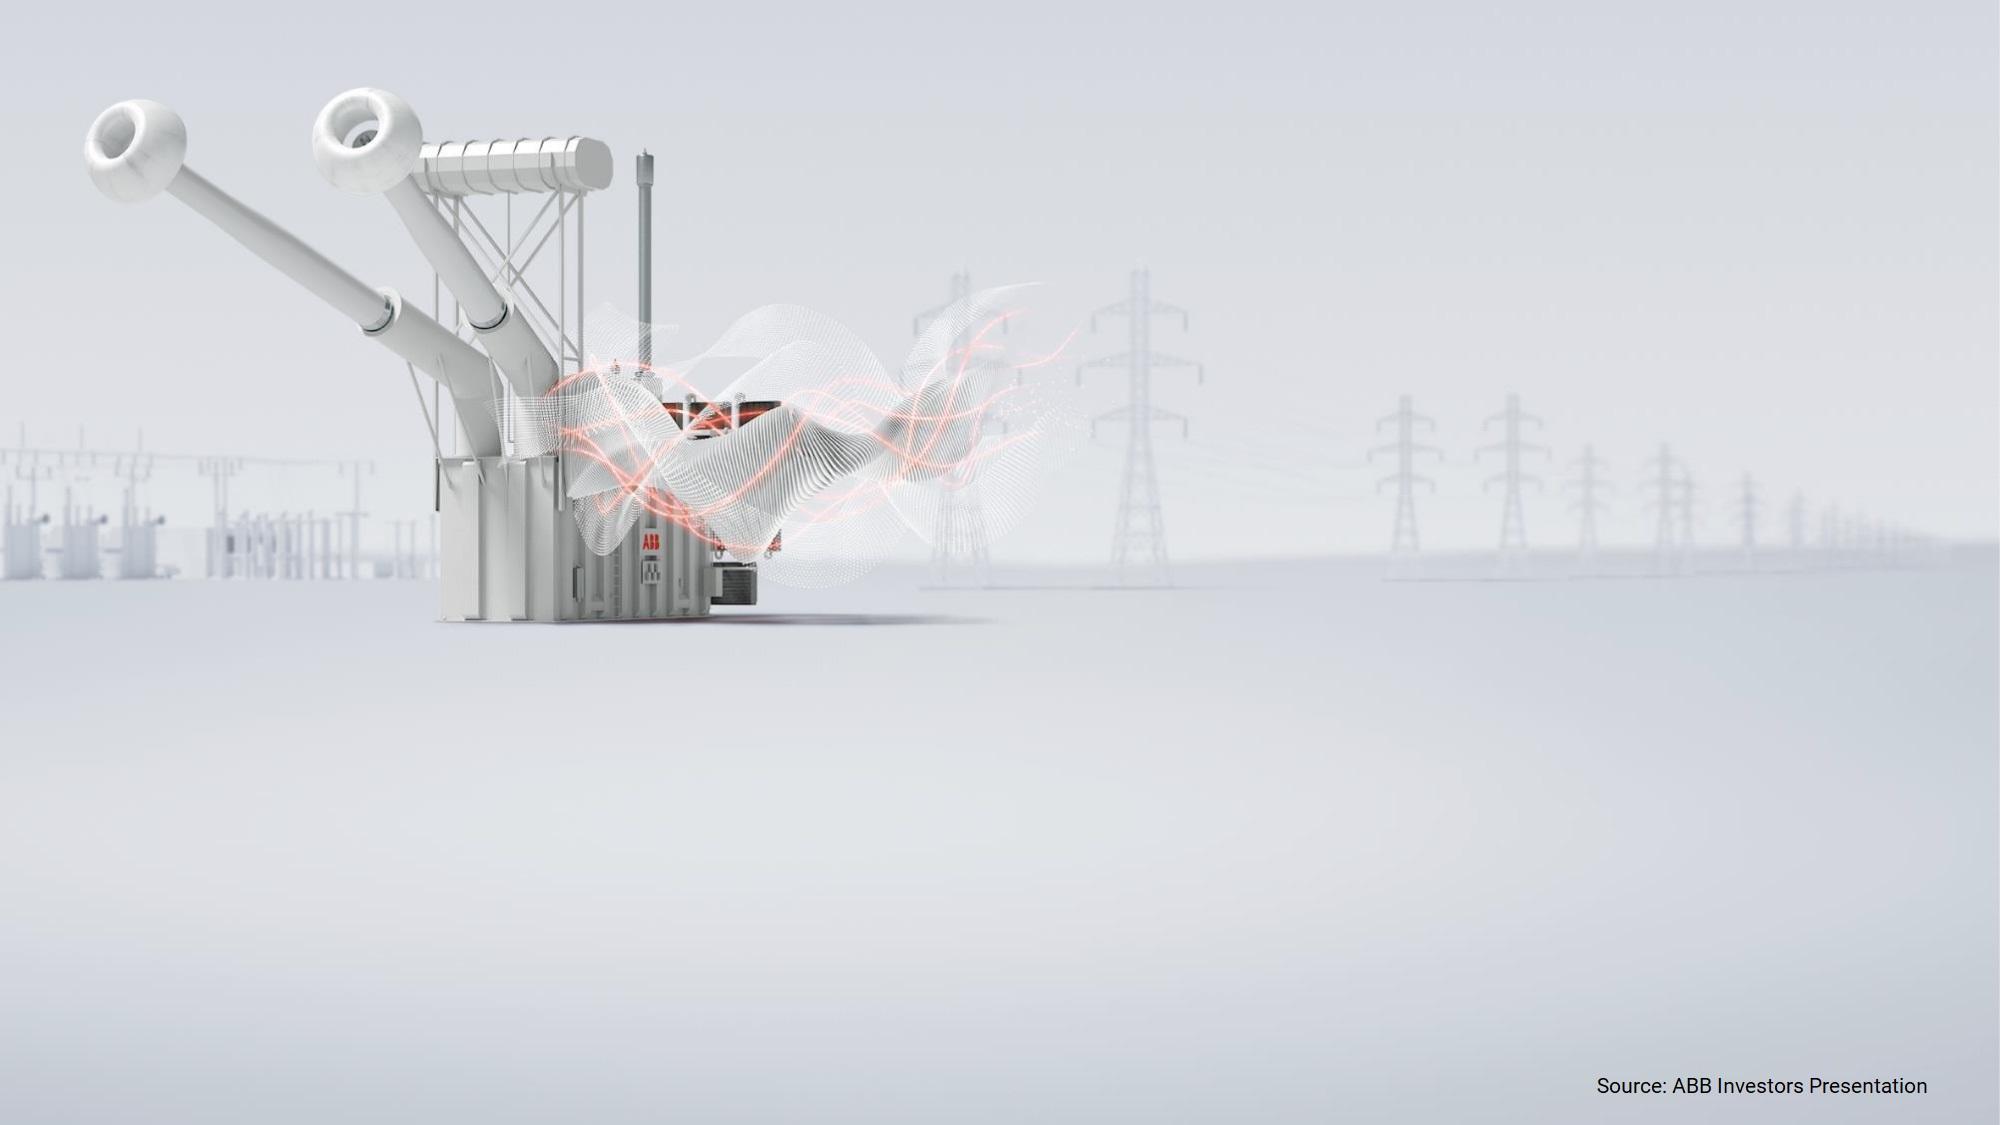 ABB-demerger-Power-Grid-Business-Hitachi